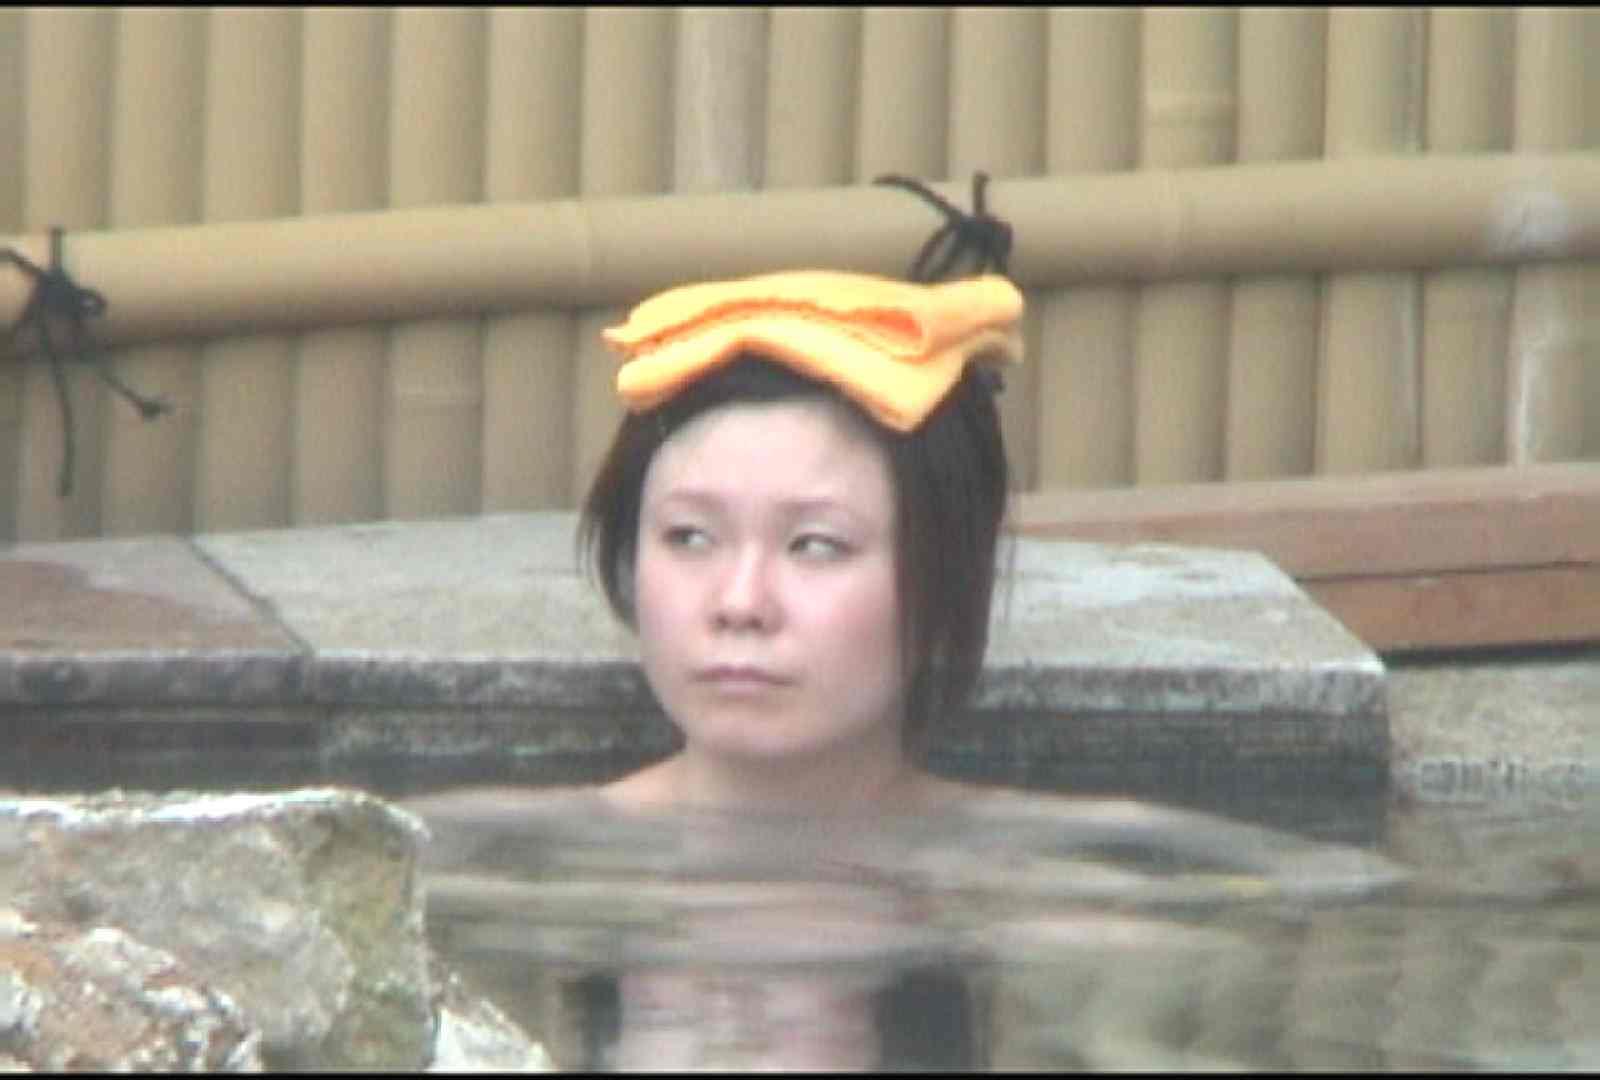 Aquaな露天風呂Vol.177 OLのエロ生活 オマンコ無修正動画無料 40連発 8